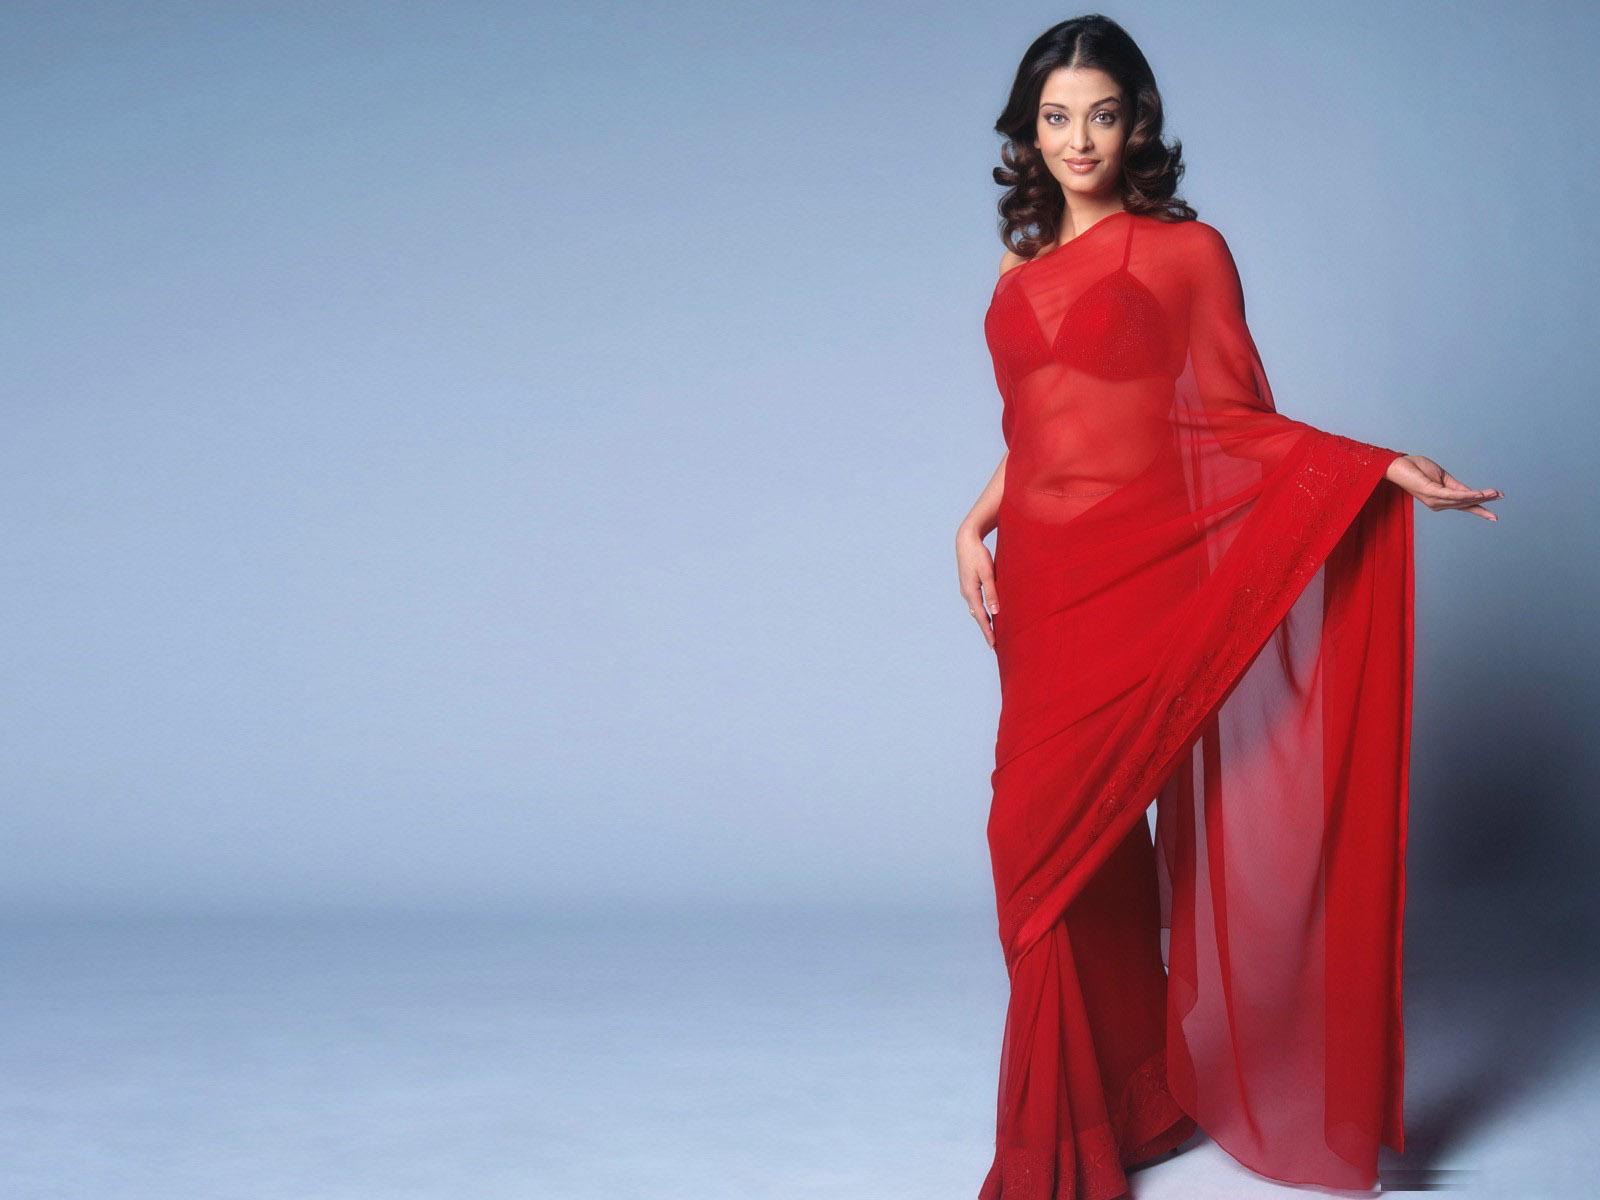 Aishwarya In Hot Saree Wallpaper HD Wallpapers 1600x1200